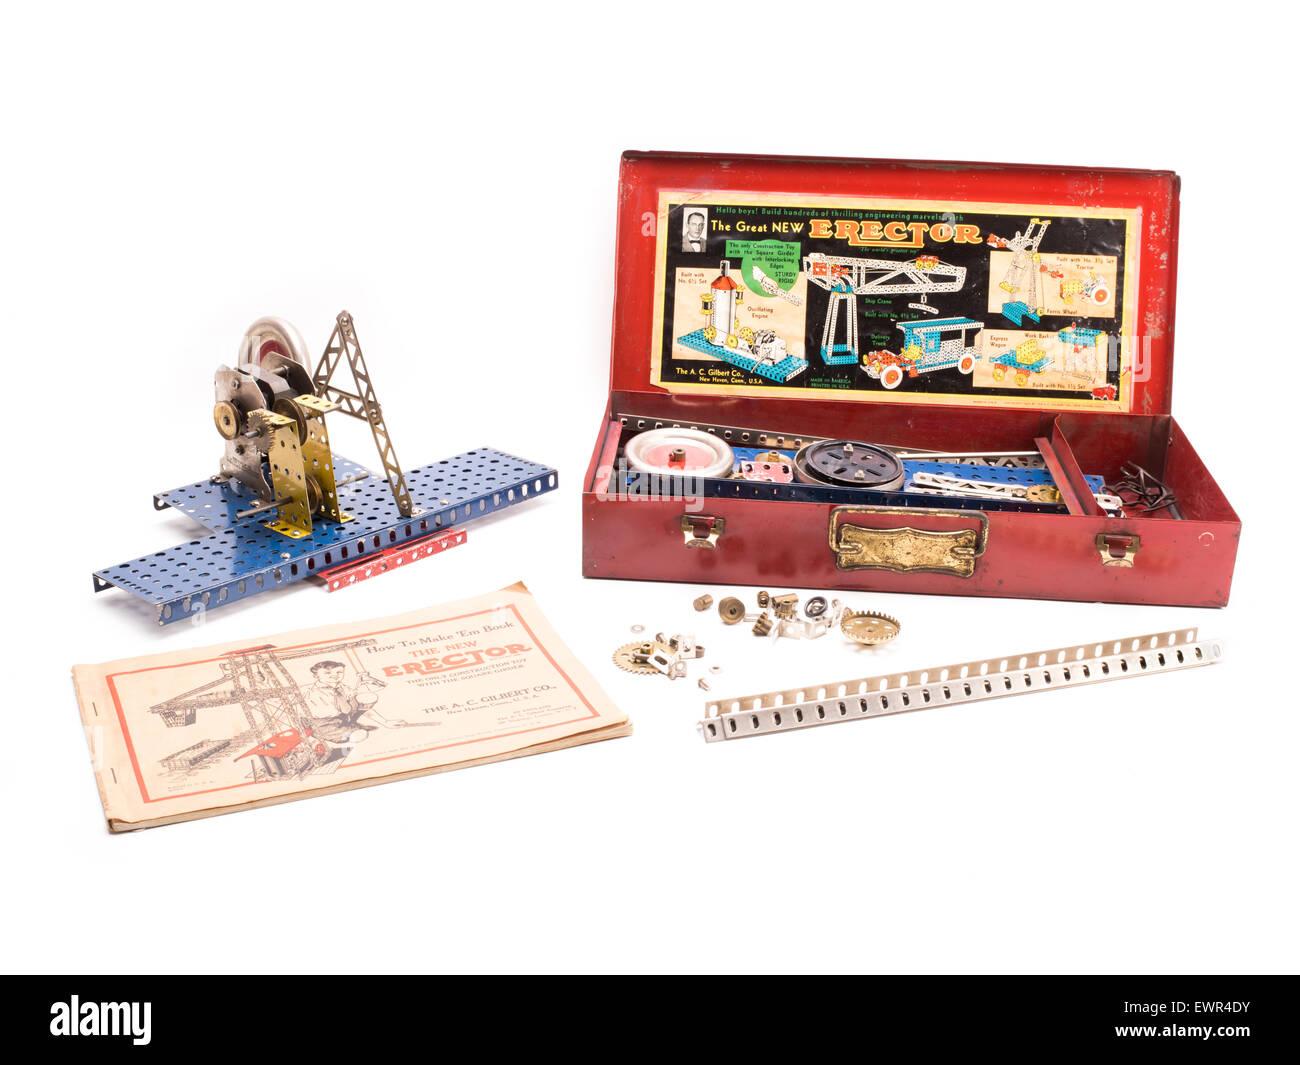 Erector Set, metal construction toy, by Alfred Carlton Gilbert of A.C. Gilbert Company aka Gilbert Toys - Stock Image